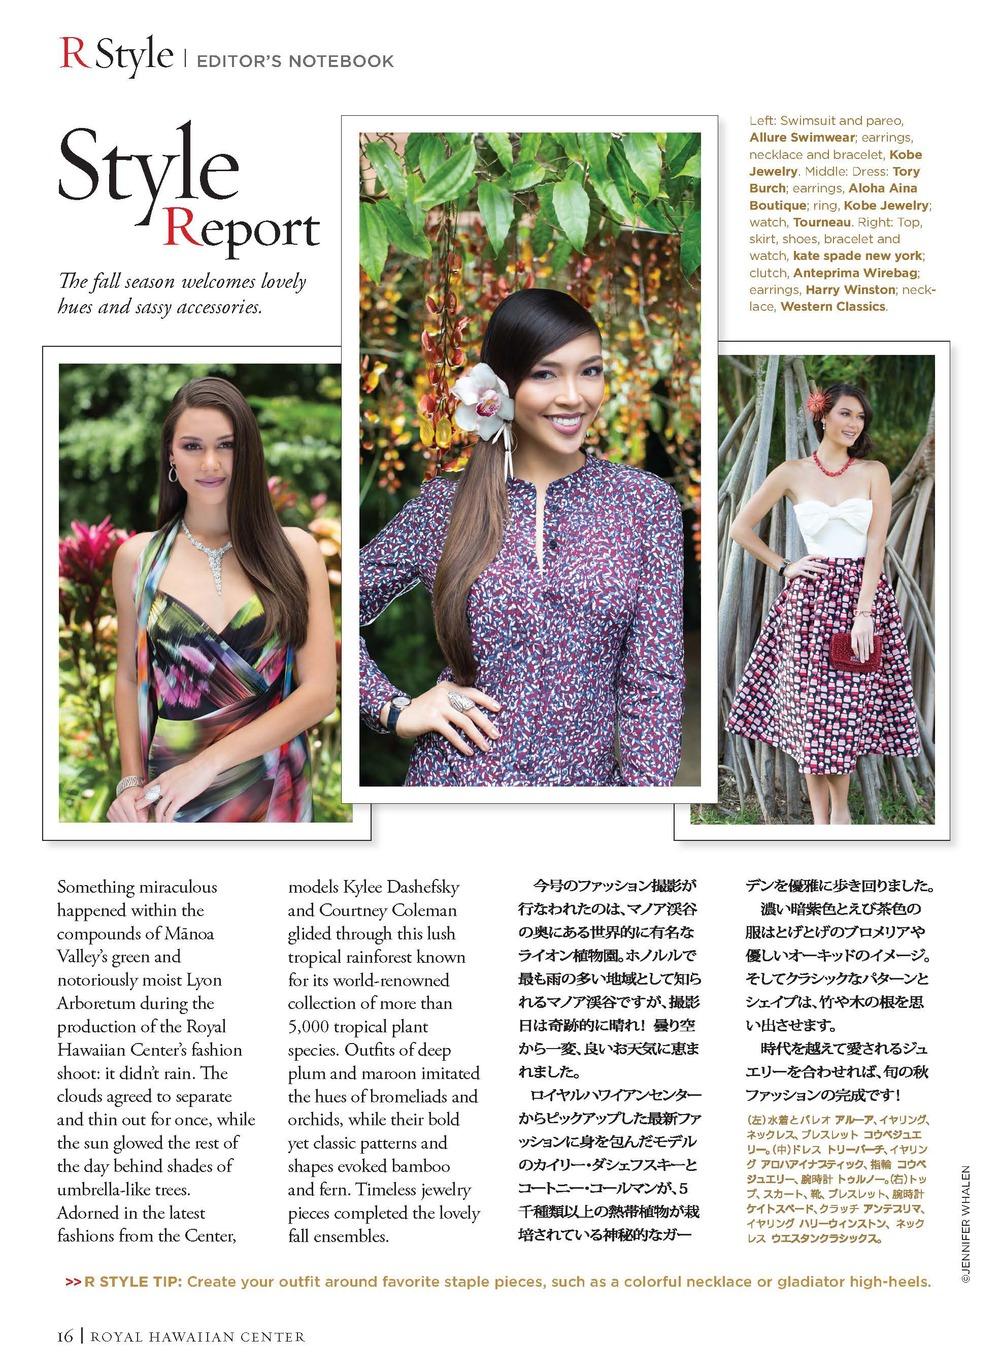 OAHRC_1511FW_Fashion_Page_2.jpg